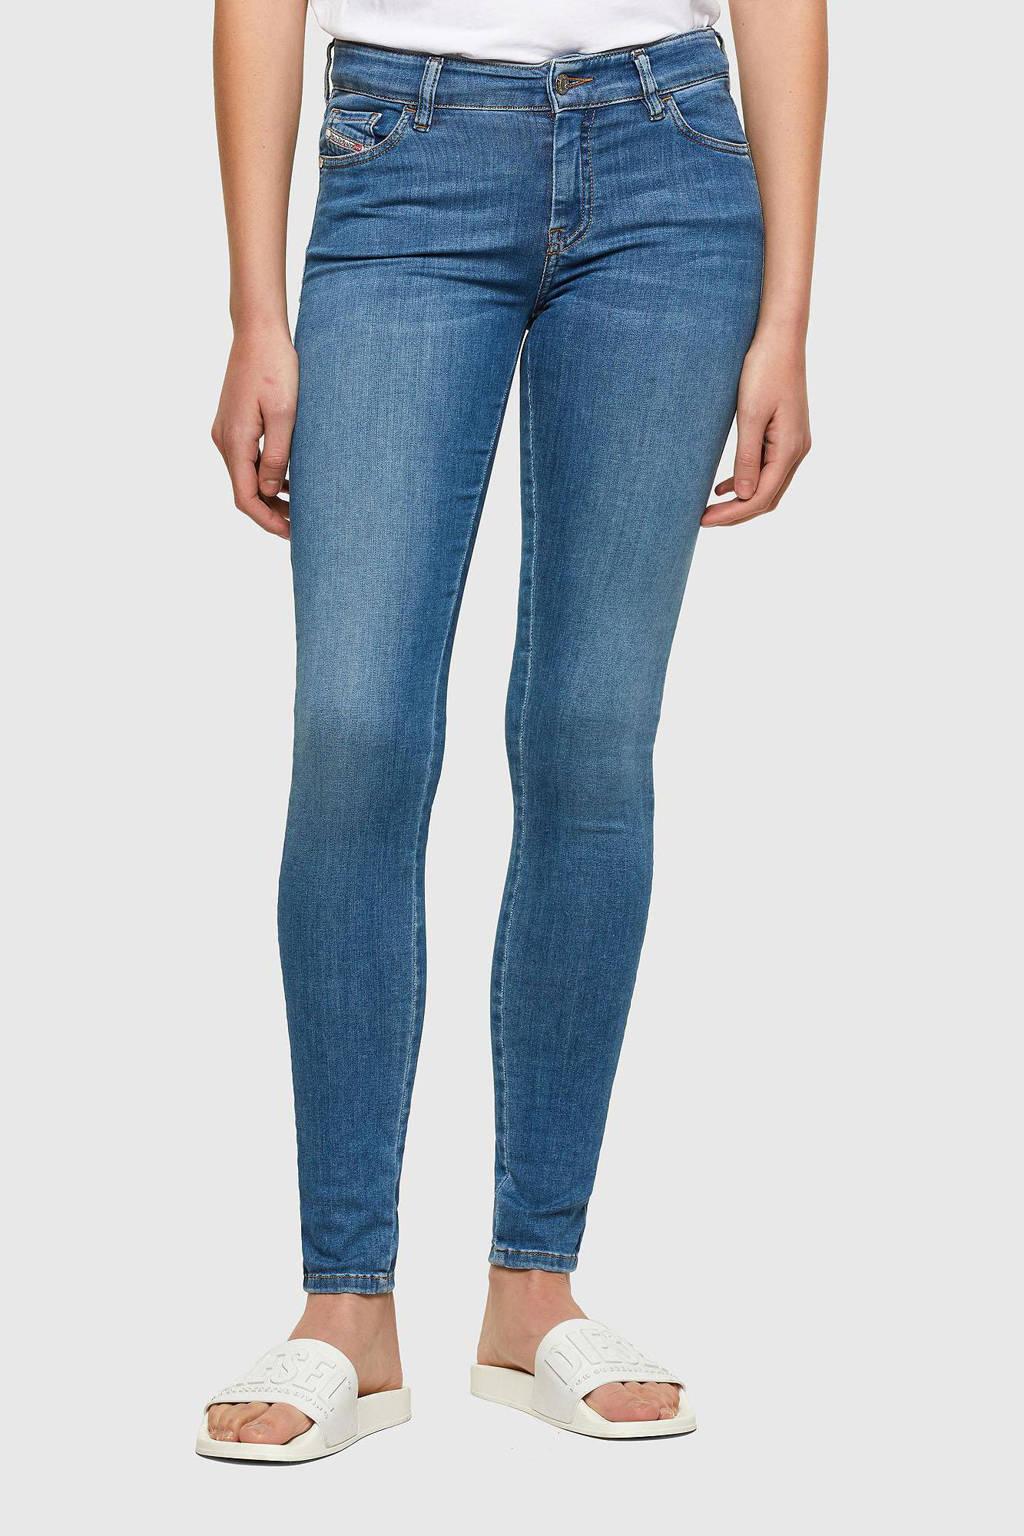 Diesel skinny jeans Slandy 01 licht blauw